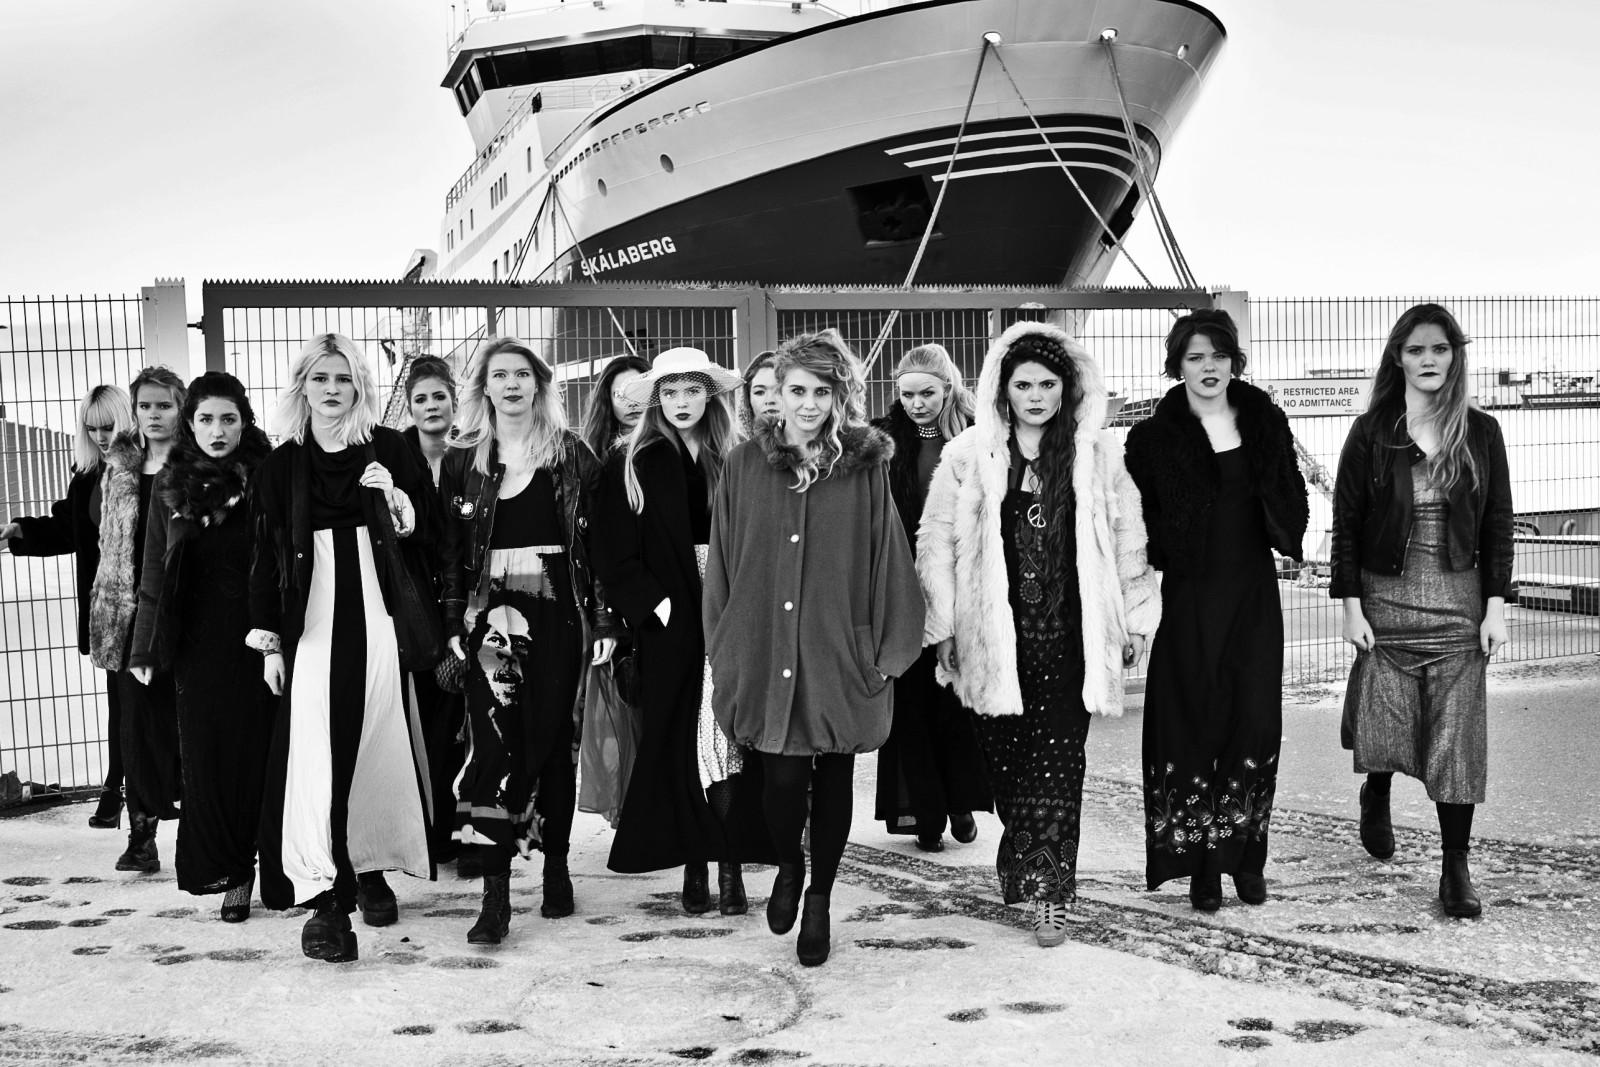 As integrantes do grupo de rap feminista Reykjavíkurdætur (via)